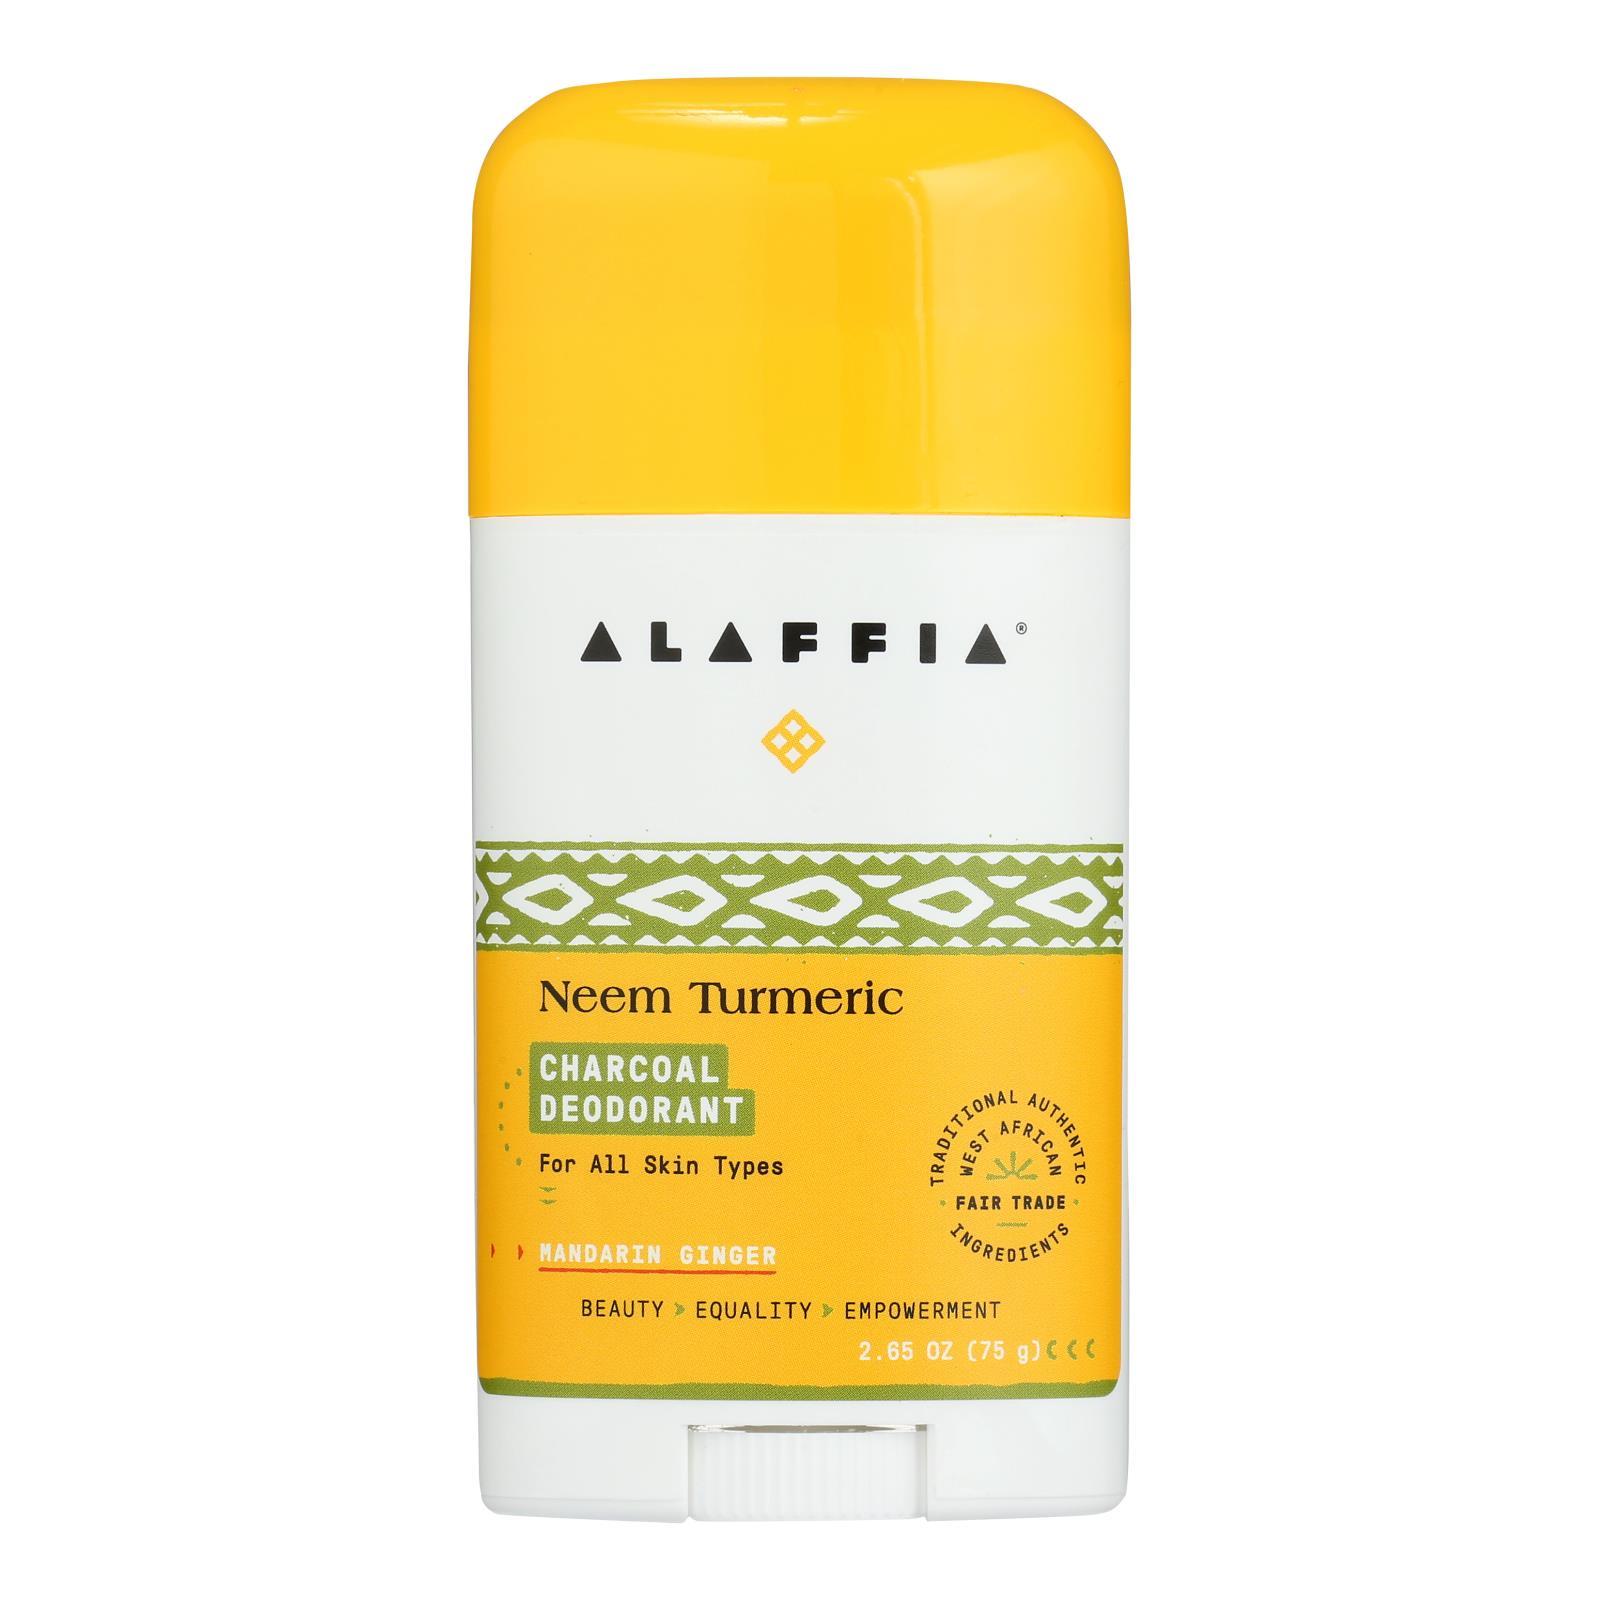 Alaffia - Deodorant Turmrc Mndrn/chrcoal - 1 Each - 2.65 OZ